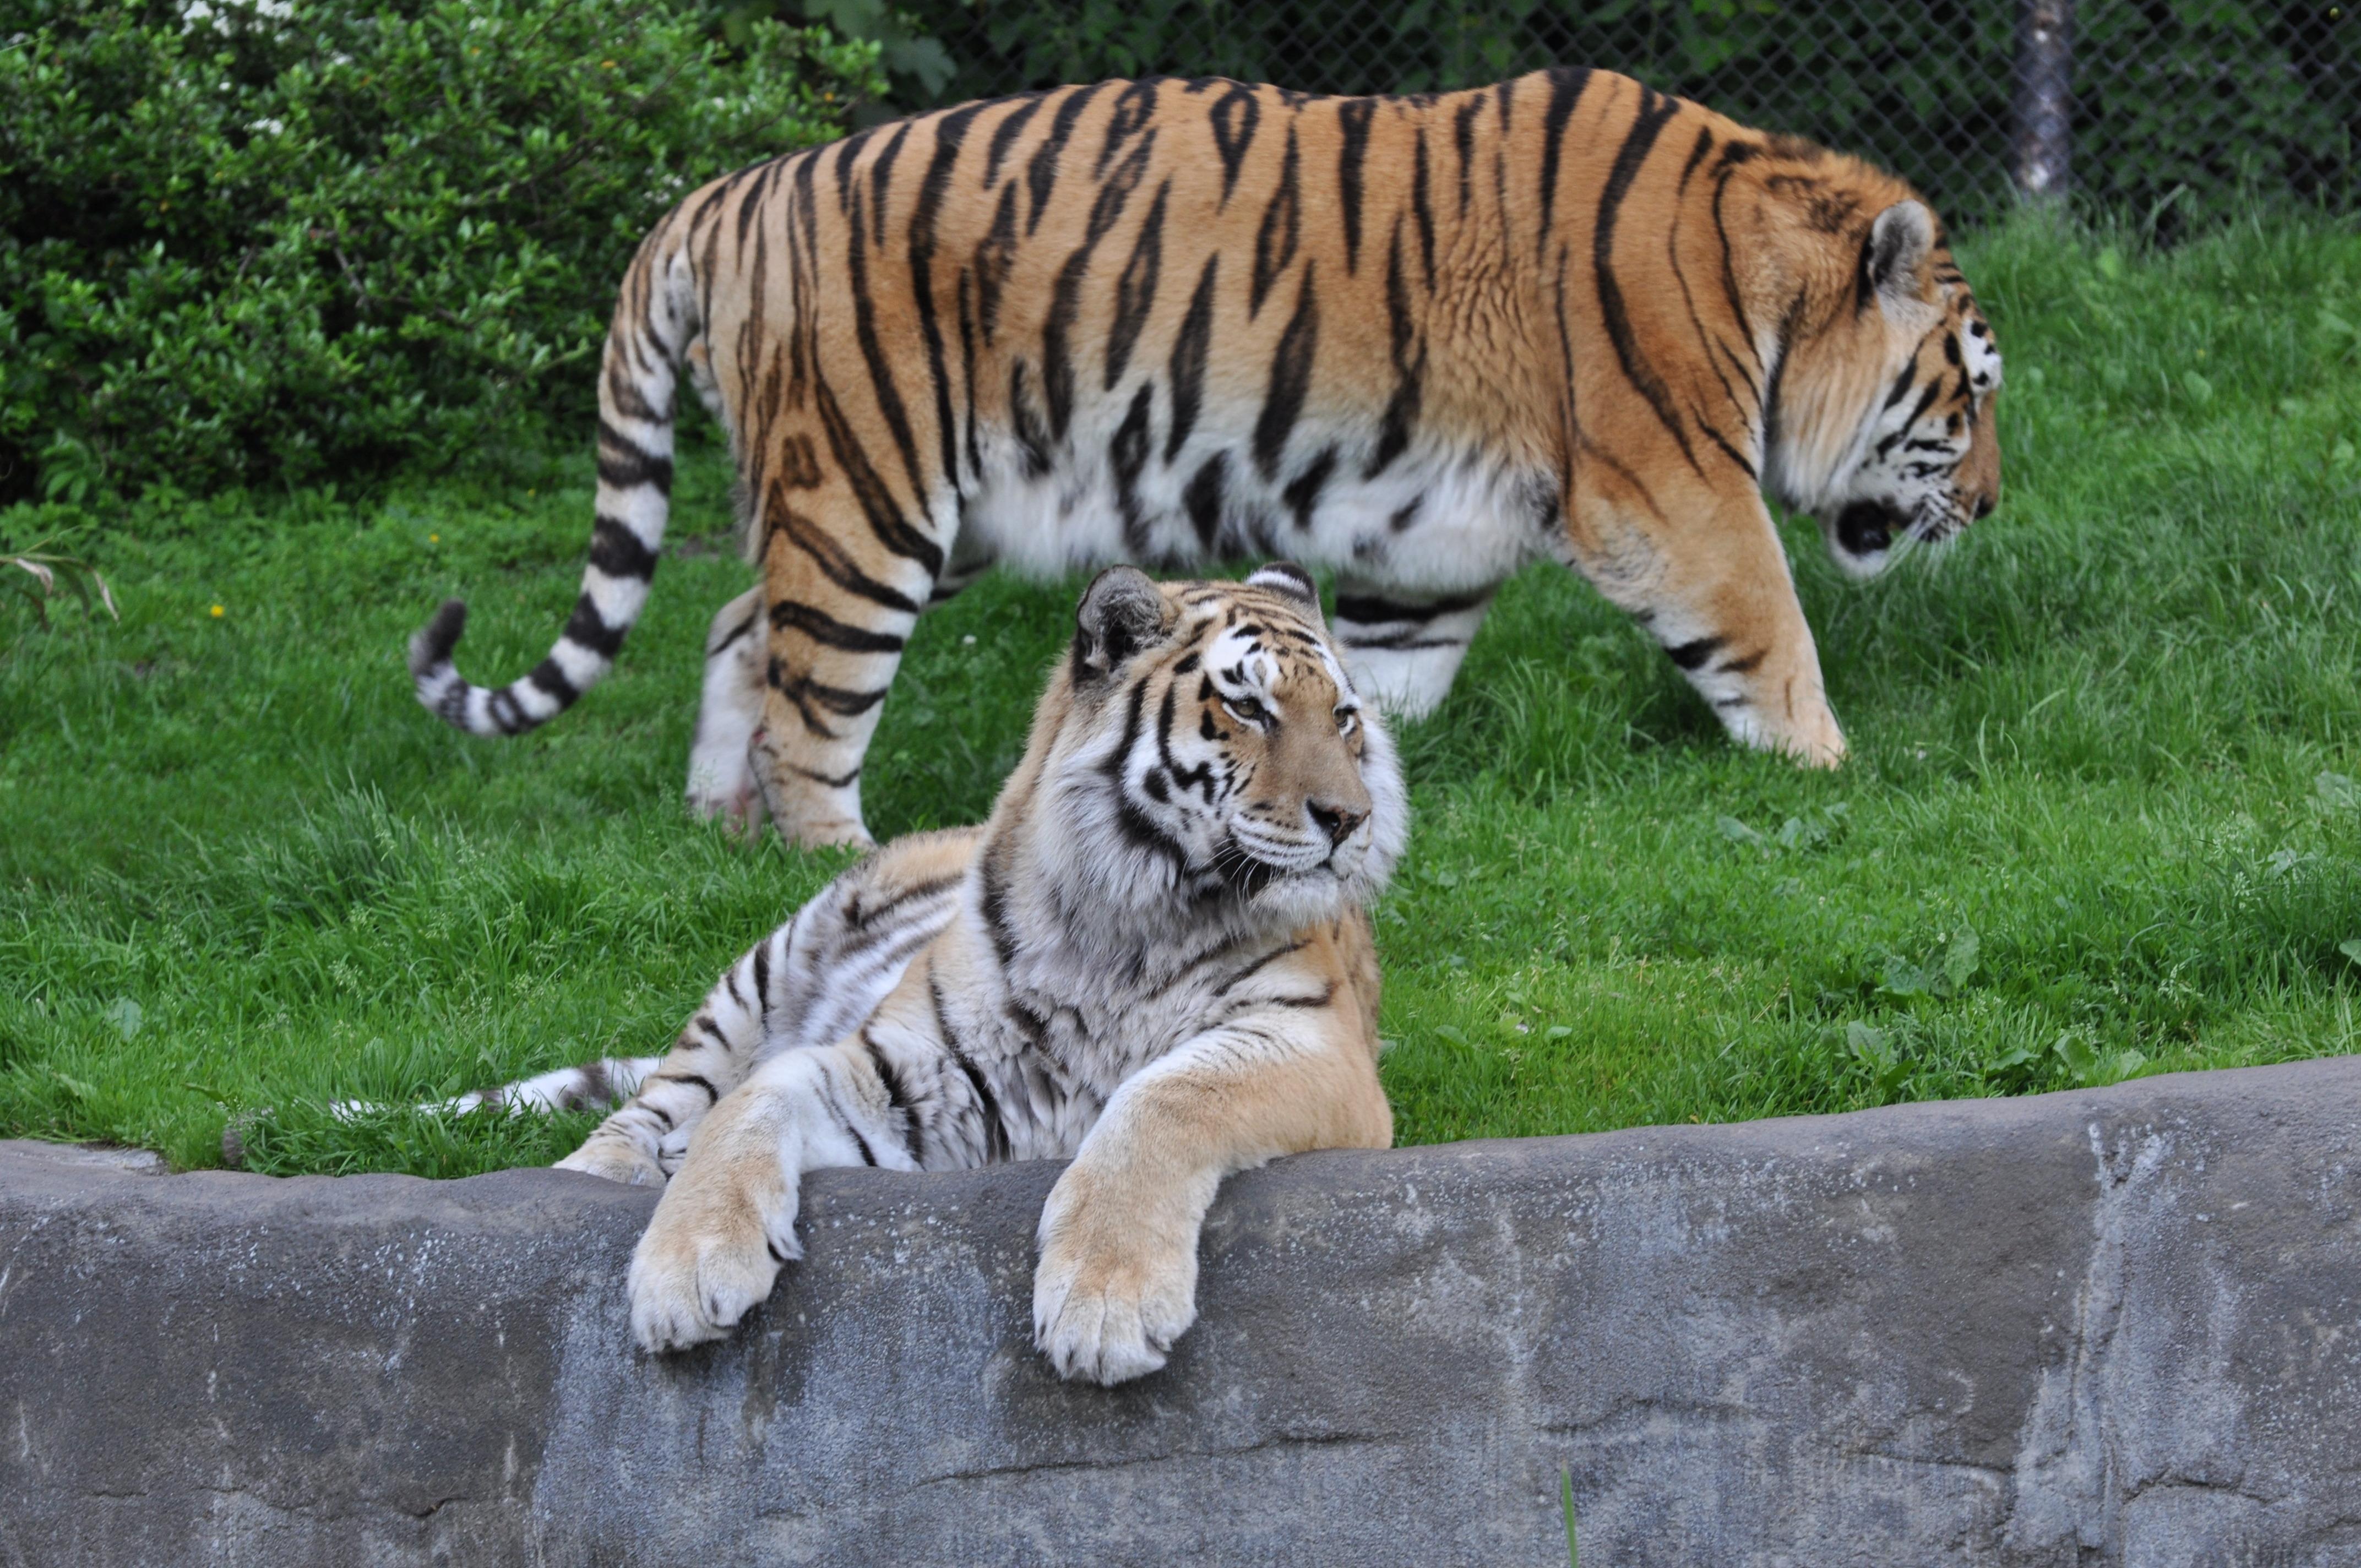 File:Panthera tigris altaica 1.JPG - Wikimedia Commons